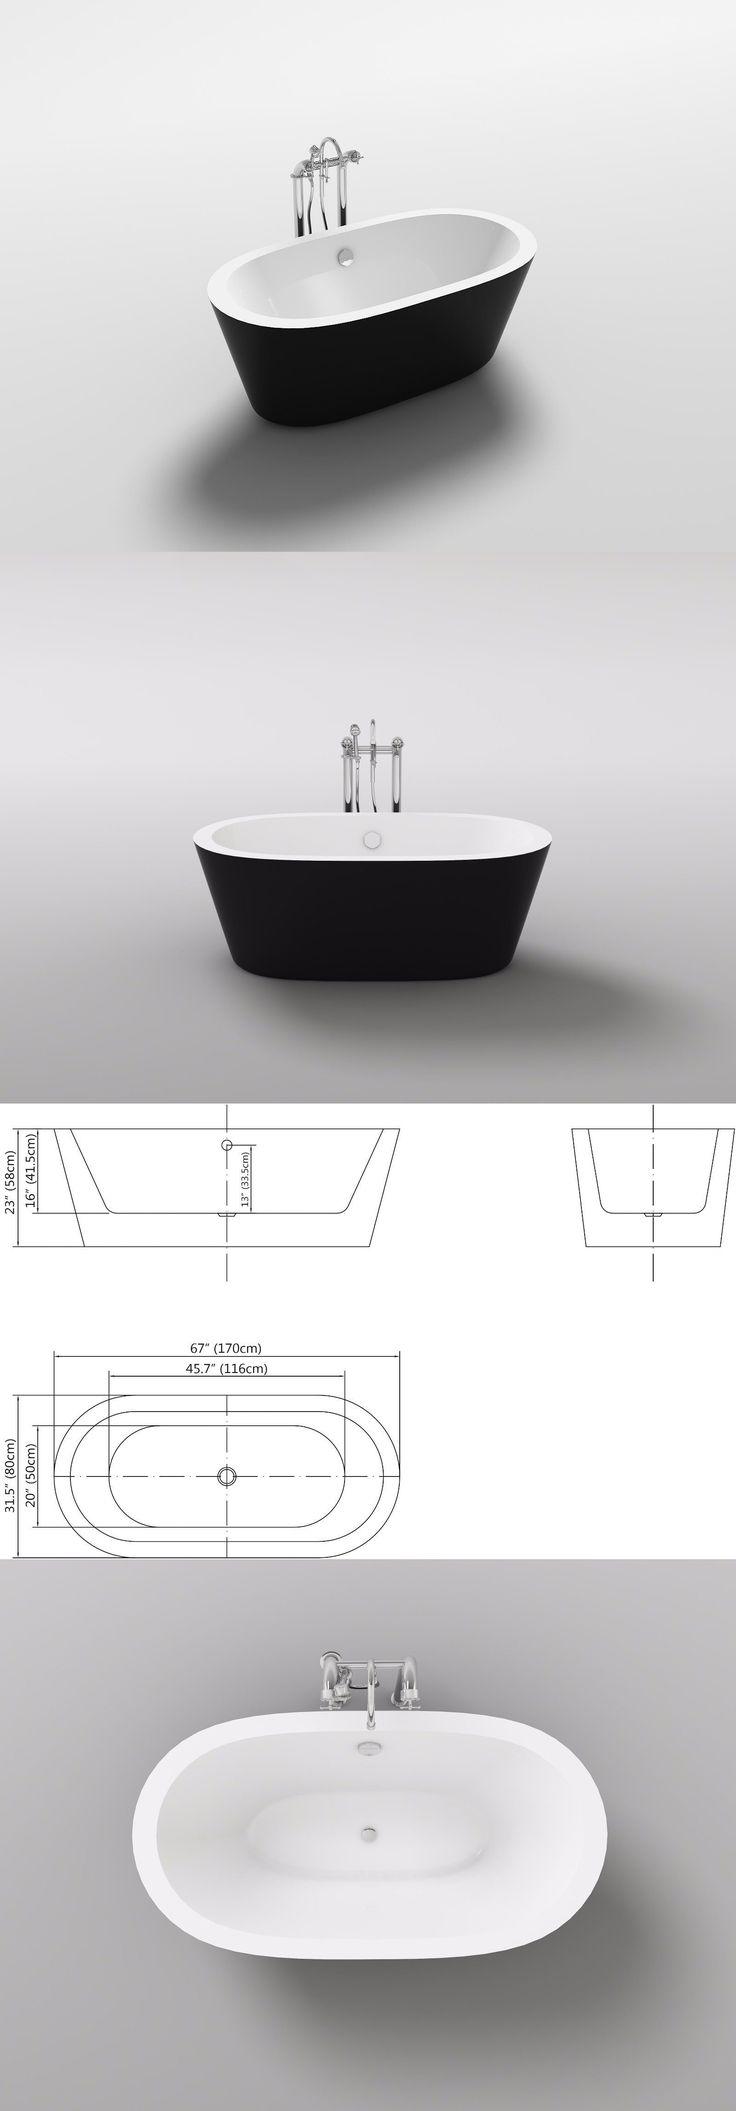 Bathtubs 42025: Kolding 67 Oval White Or Black Acrylic Bath Tub Freestanding Bathtub Soaker New -> BUY IT NOW ONLY: $879 on eBay!